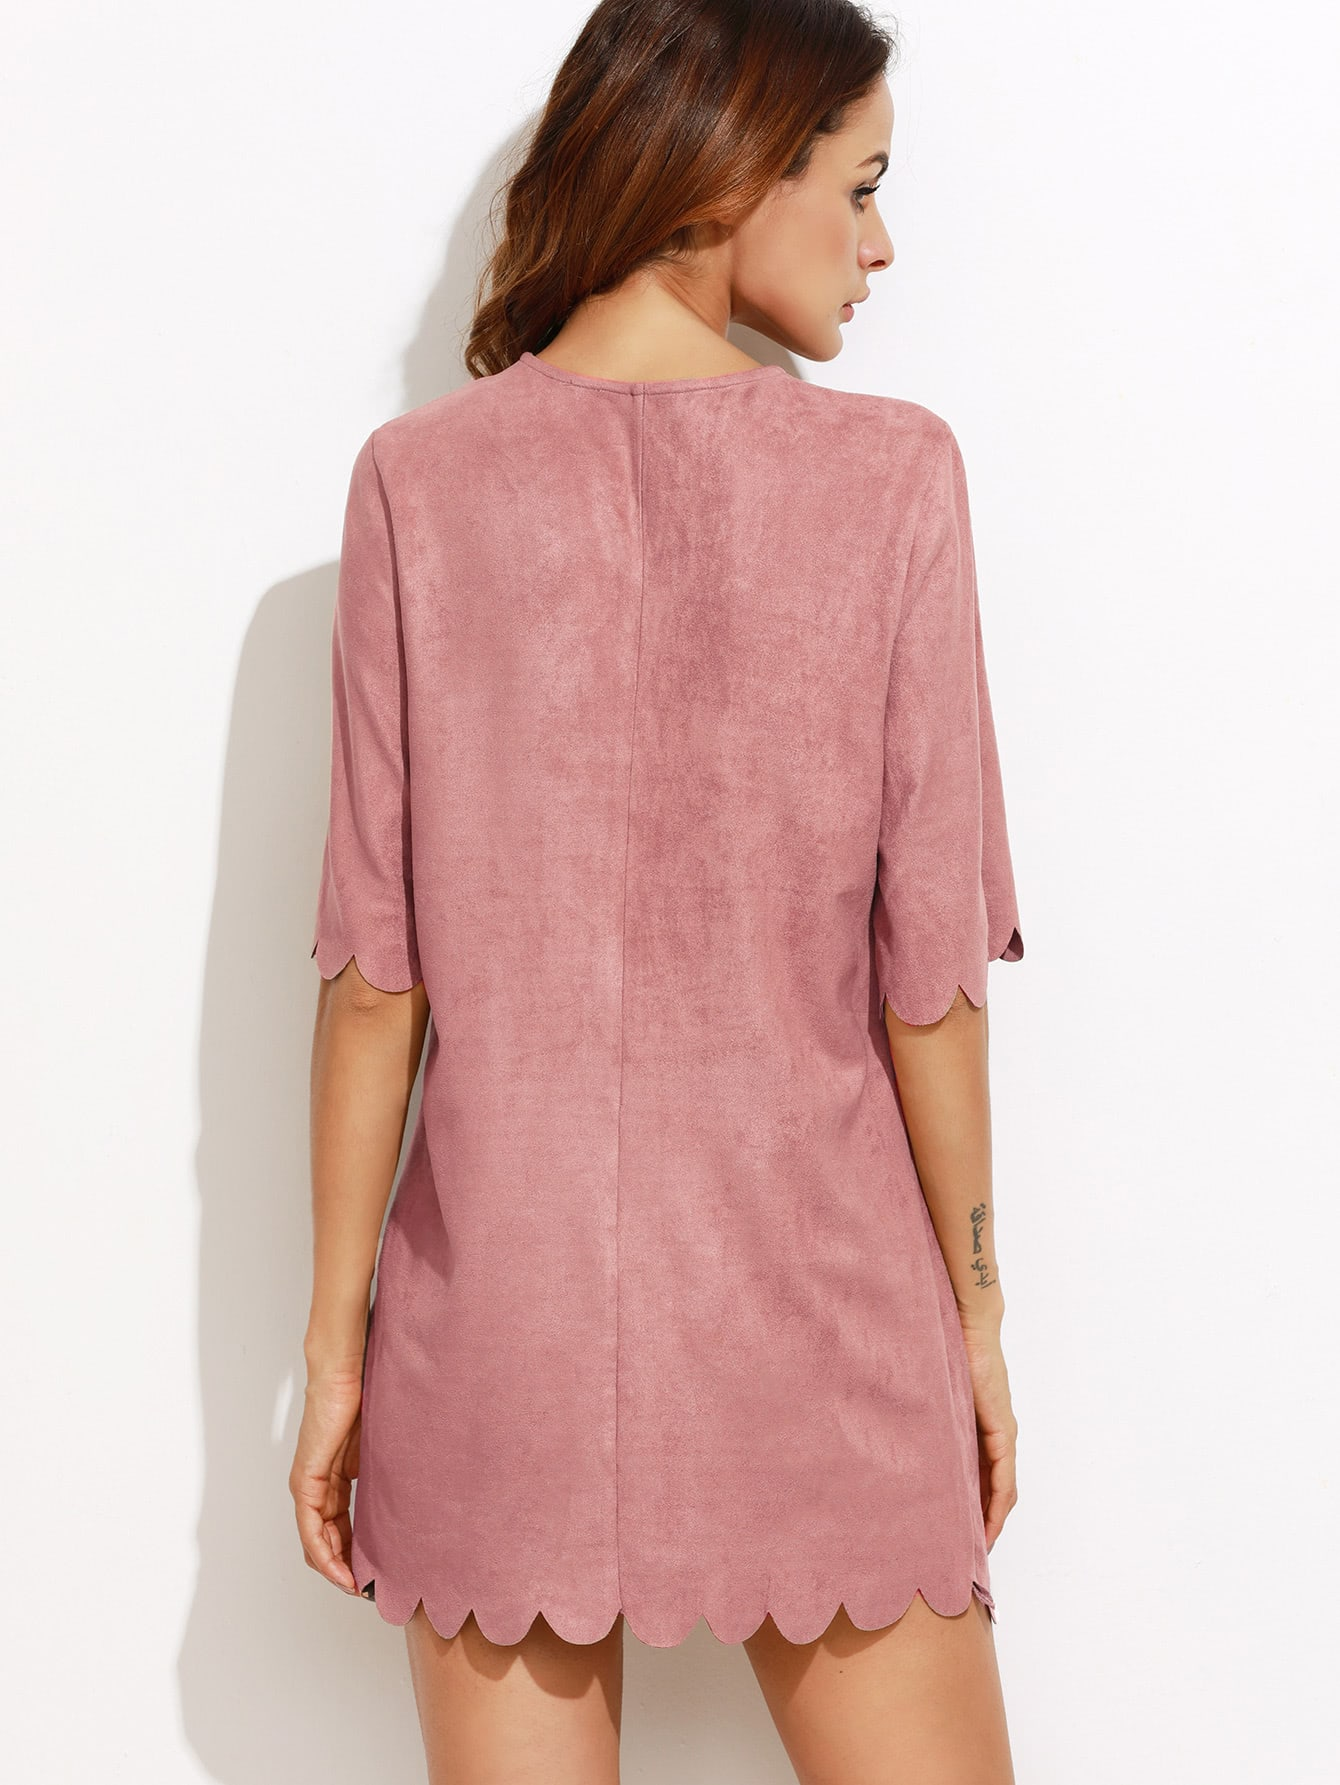 Vestido festoneado con antelina sintética - rosa -Spanish SheIn ...